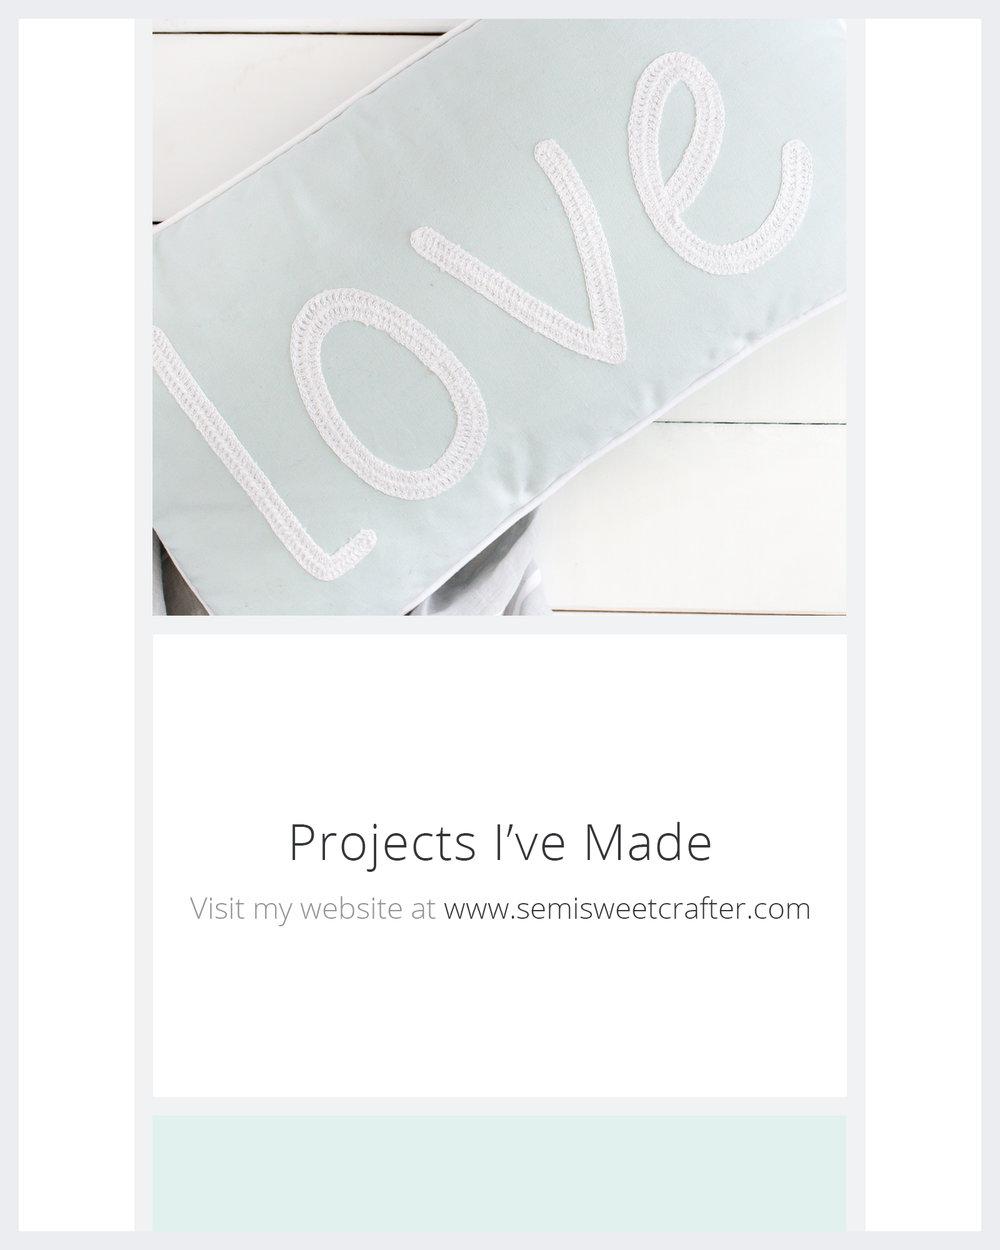 ProjectsIveMade.jpg